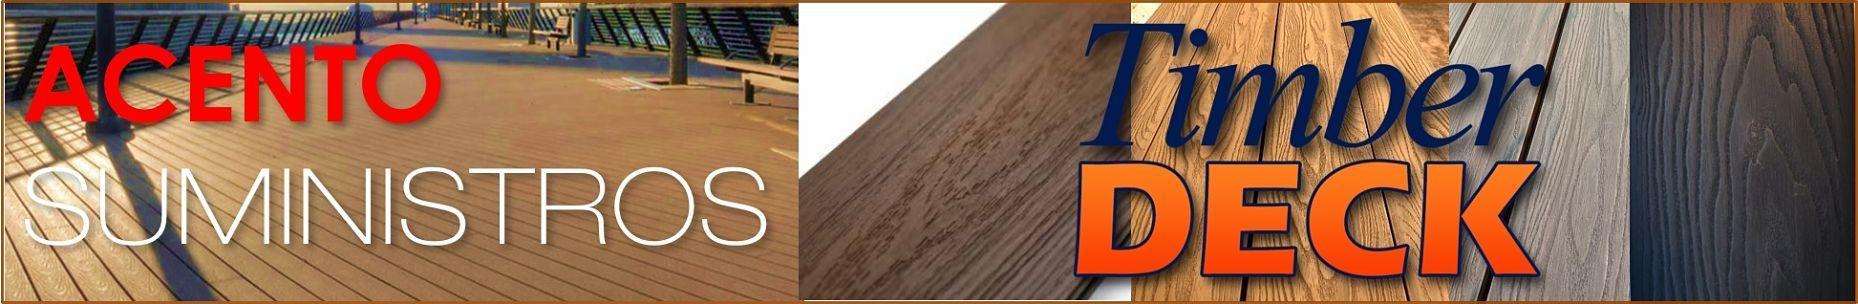 Deck Liston WPC veta madera Acento Suministros